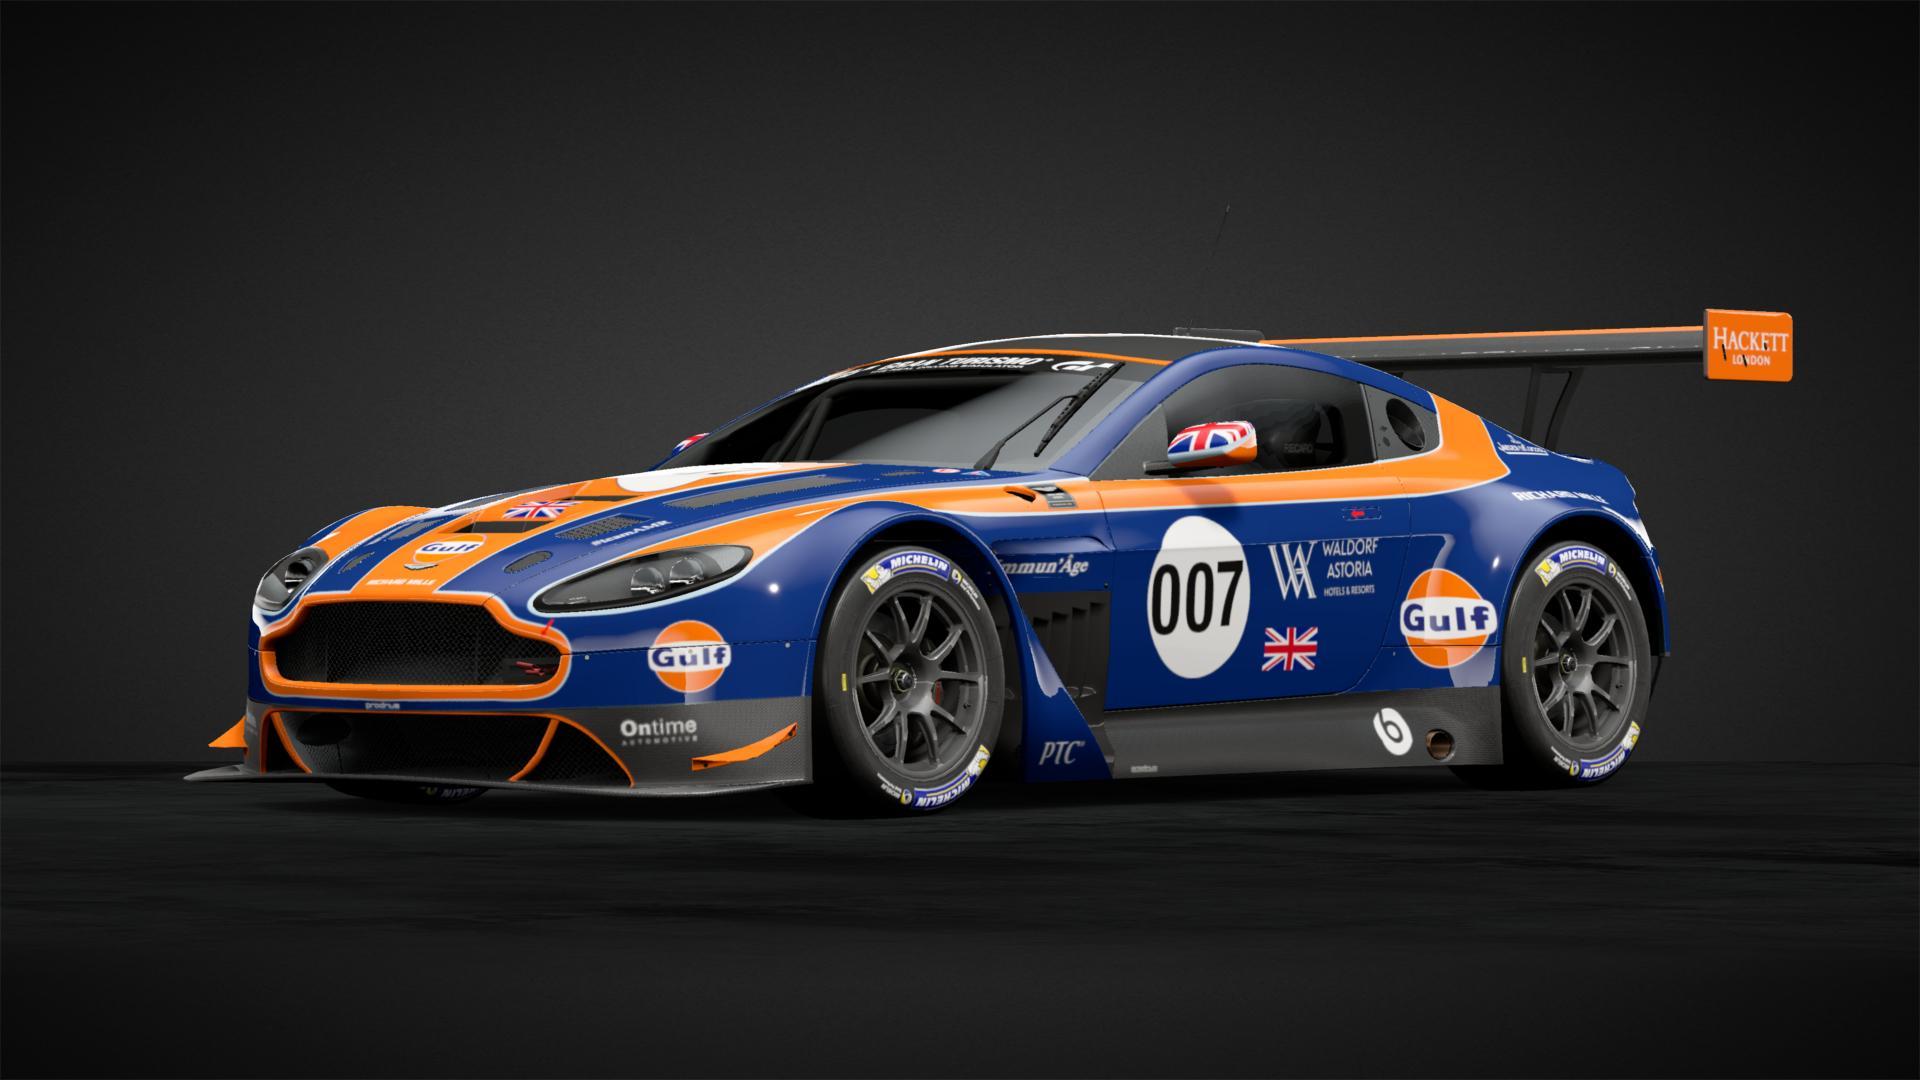 Aston Martin Racing Gulf Car Livery By Tob Racer Community Gran Turismo Sport